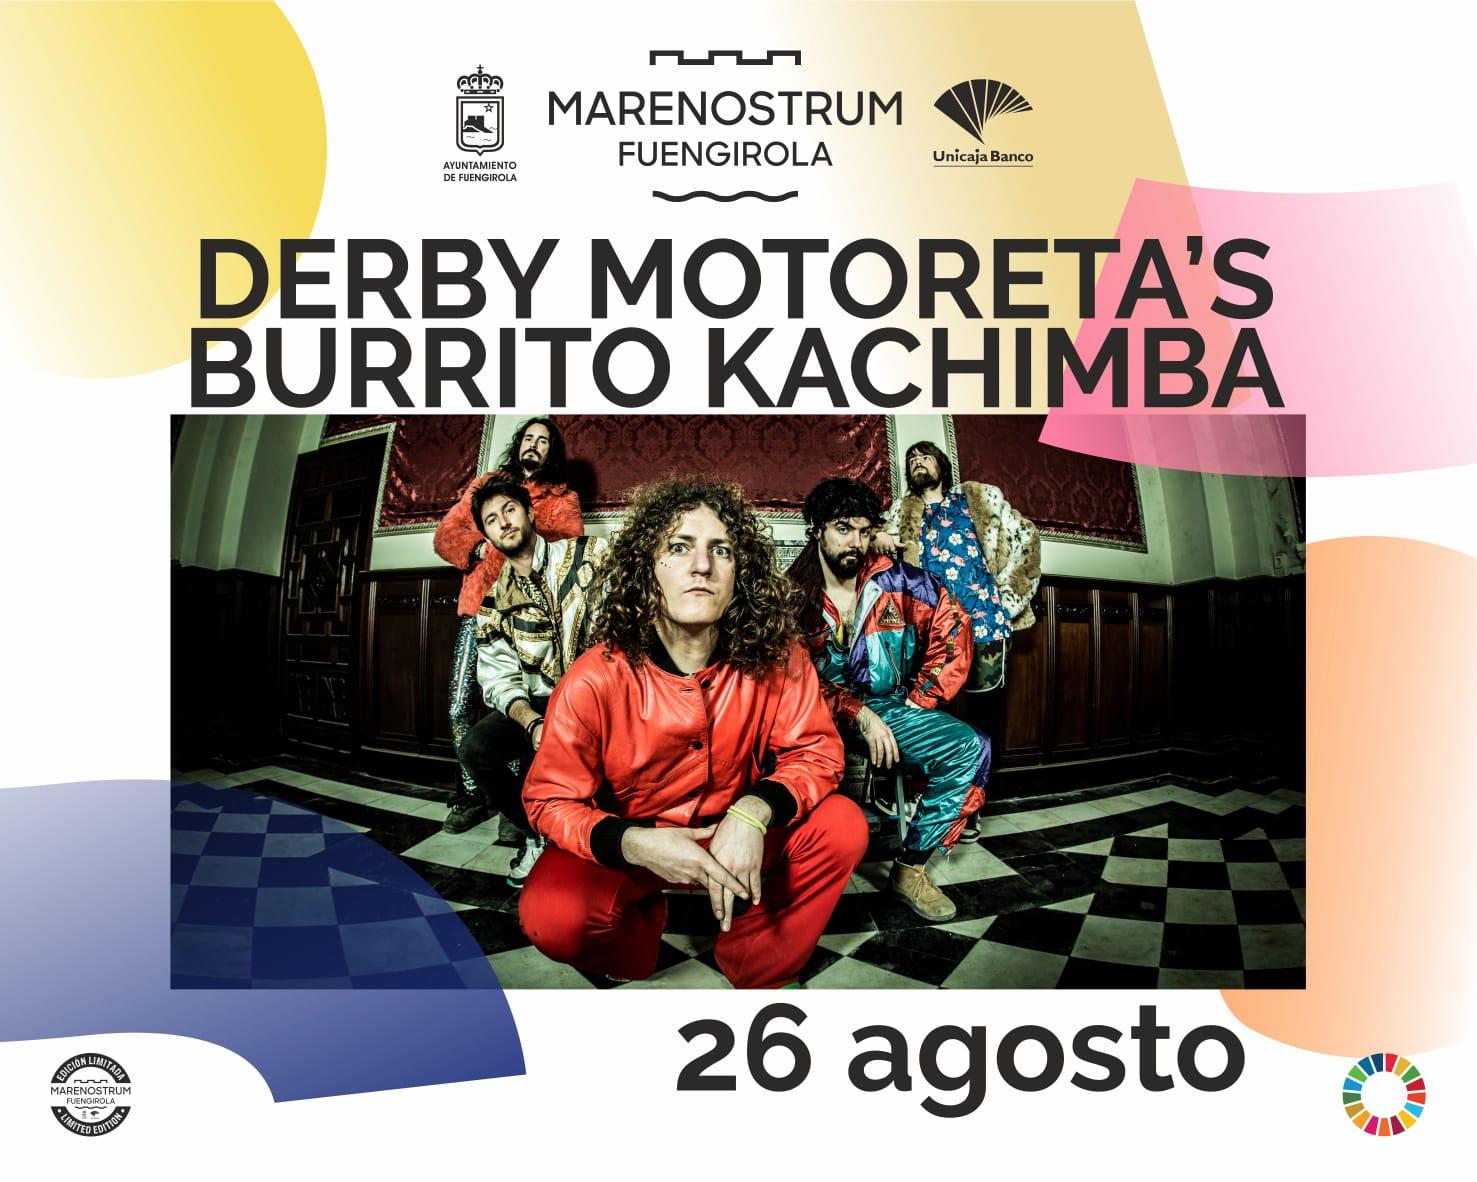 Derby Motoretas Burrito Kachimba Oh Salvaje Marenostrum